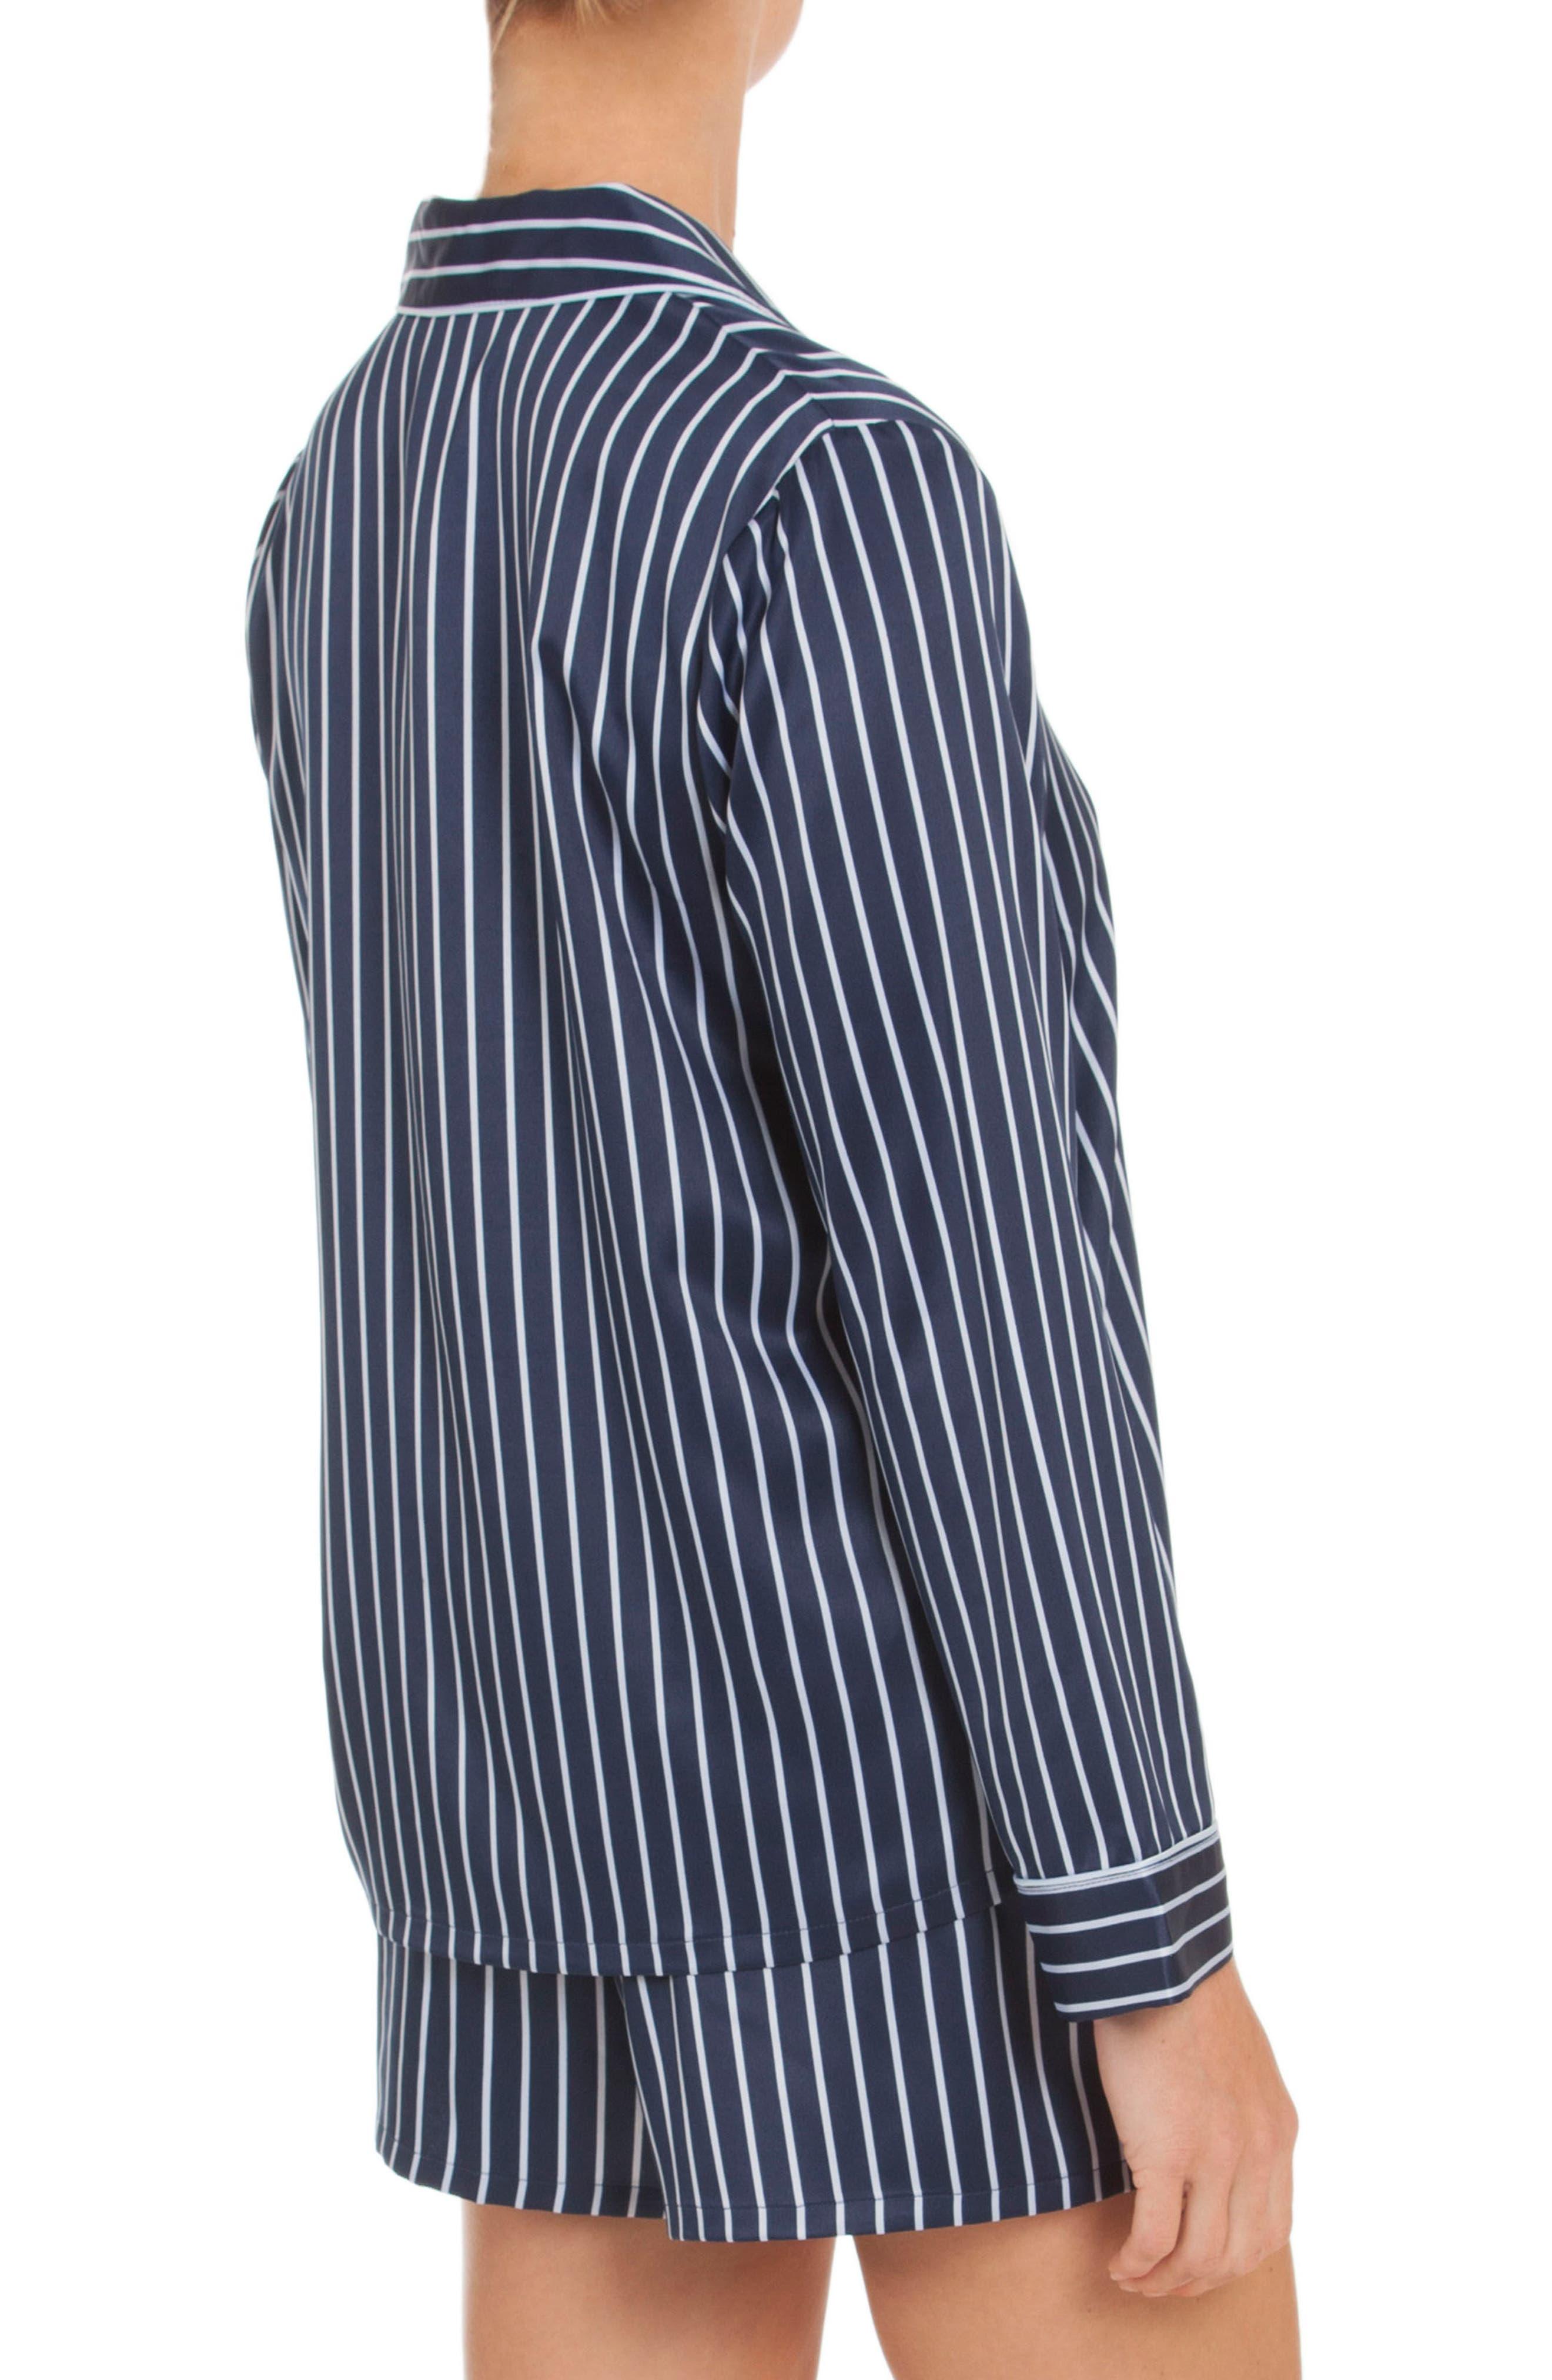 Short Pajamas,                             Alternate thumbnail 2, color,                             400